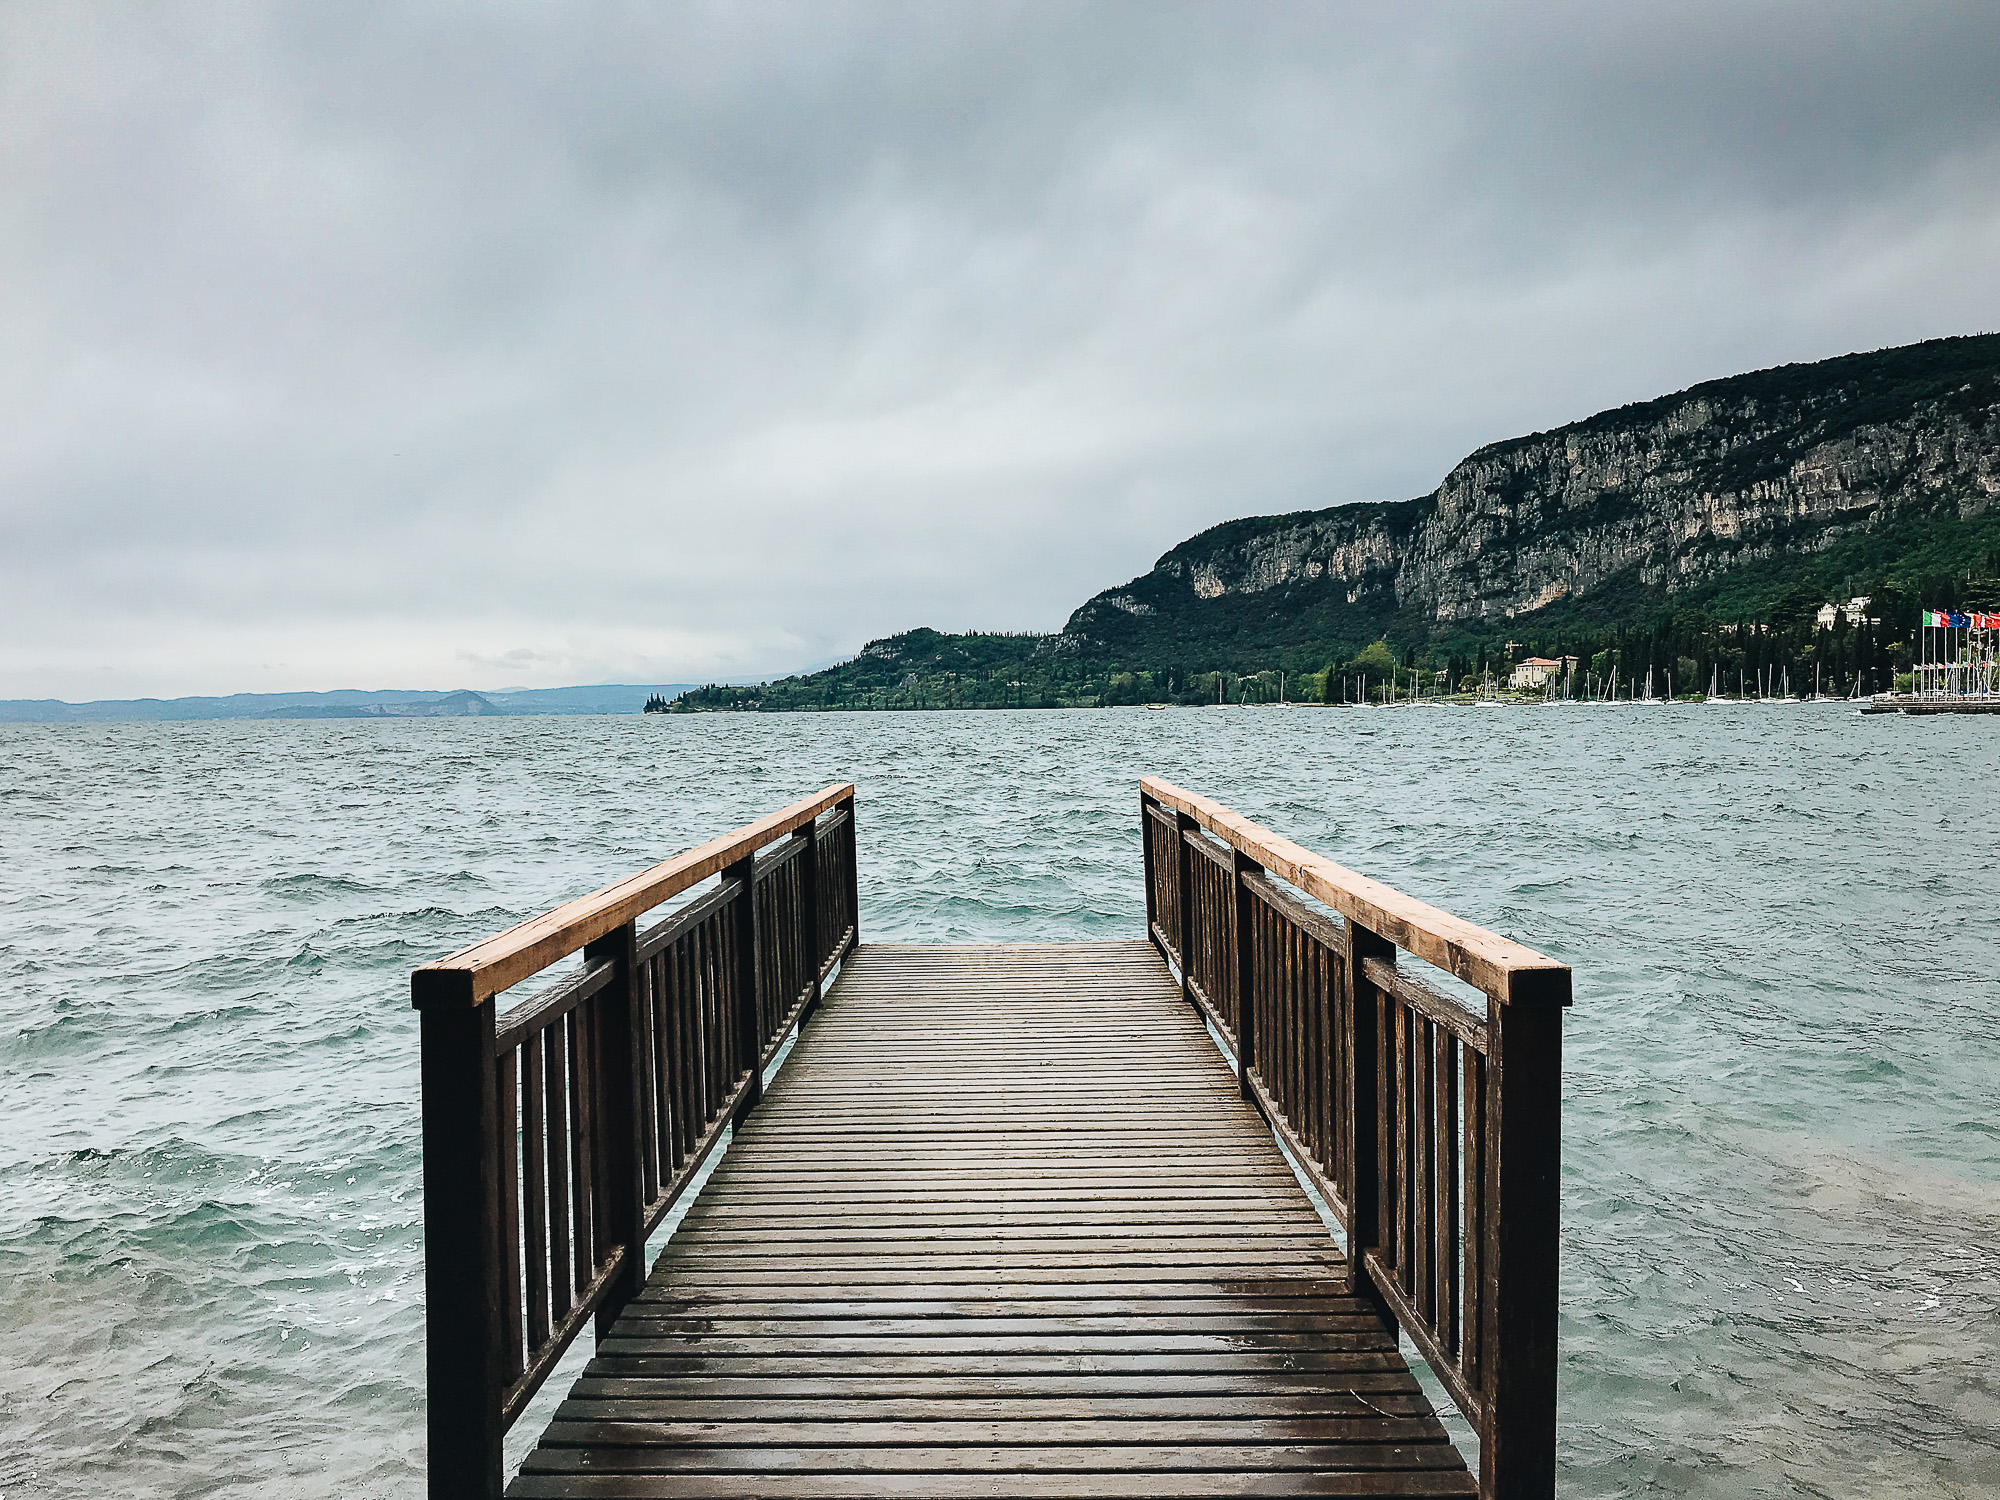 OurBeautifulAdventure-LakeGarda-Italy-Blog-6409.jpg